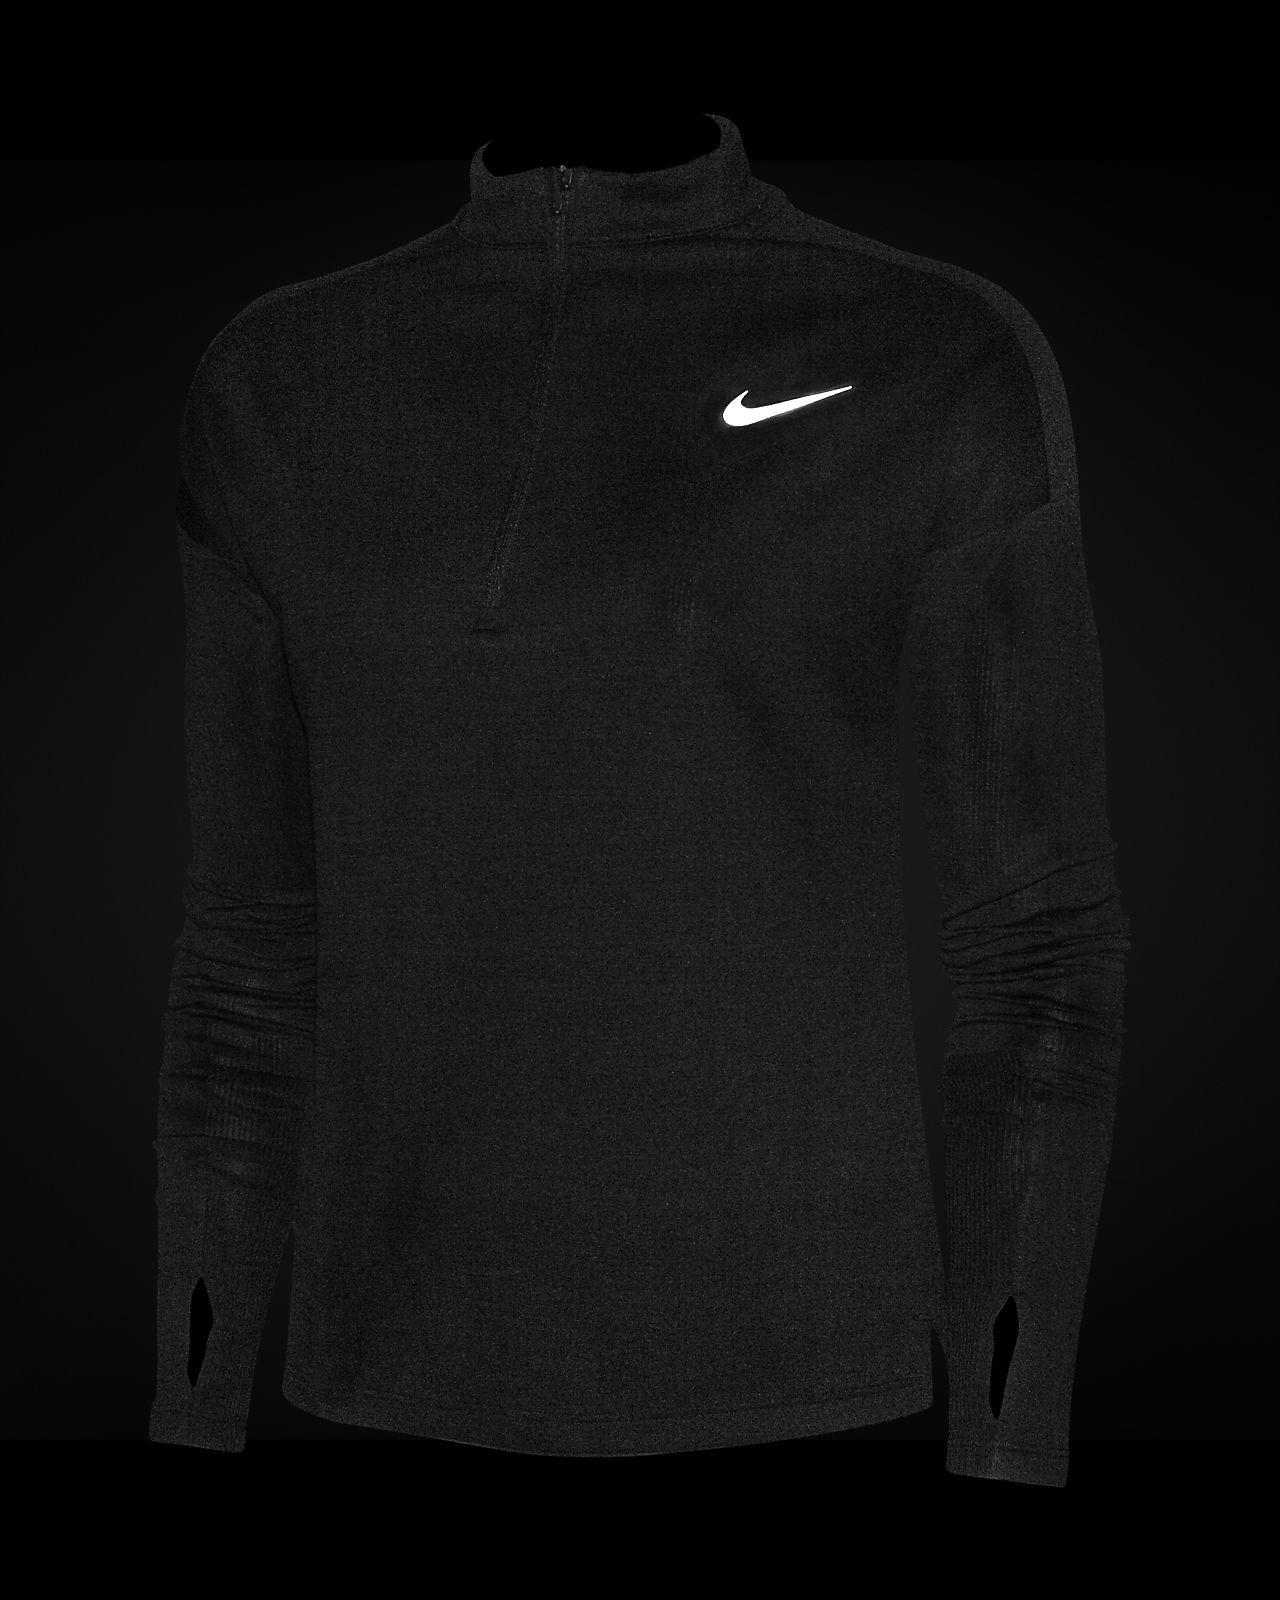 Running Pacer Mujer Con Media De Nike Camiseta Cremallera sBrCxdhQto